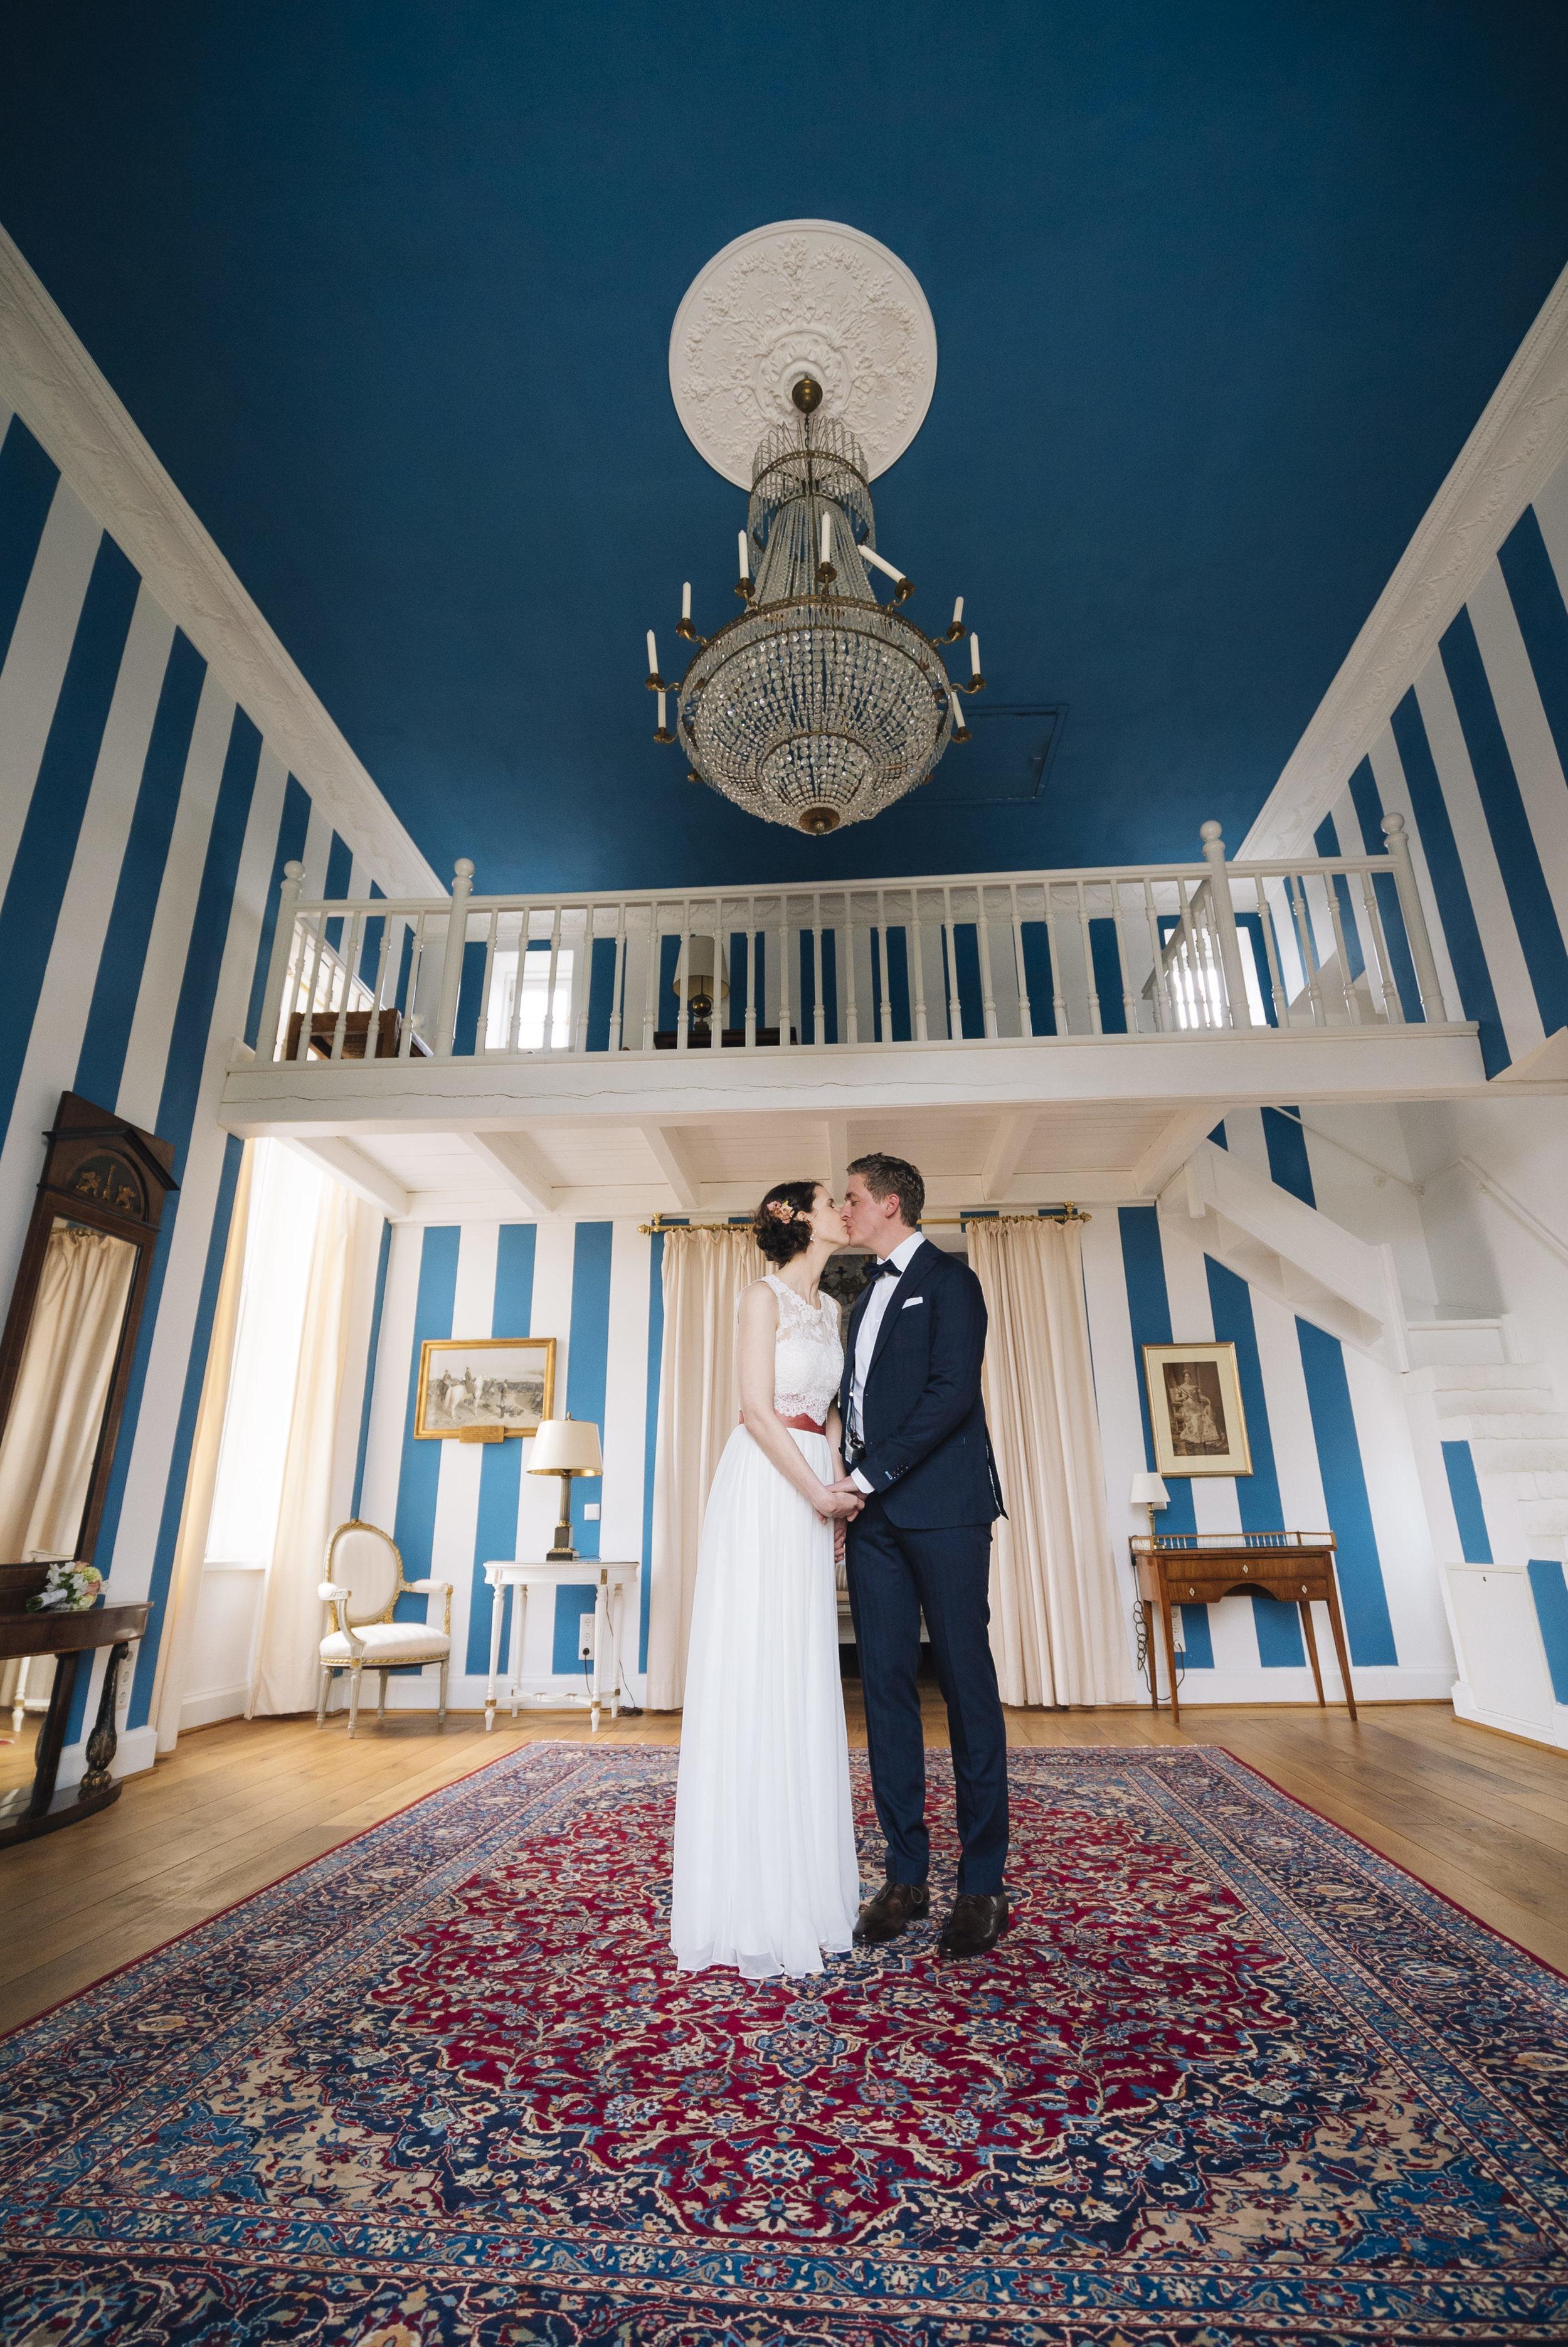 Hochzeitsfotograf-Schlossruine-Hertefeld-Weeze-018.jpg